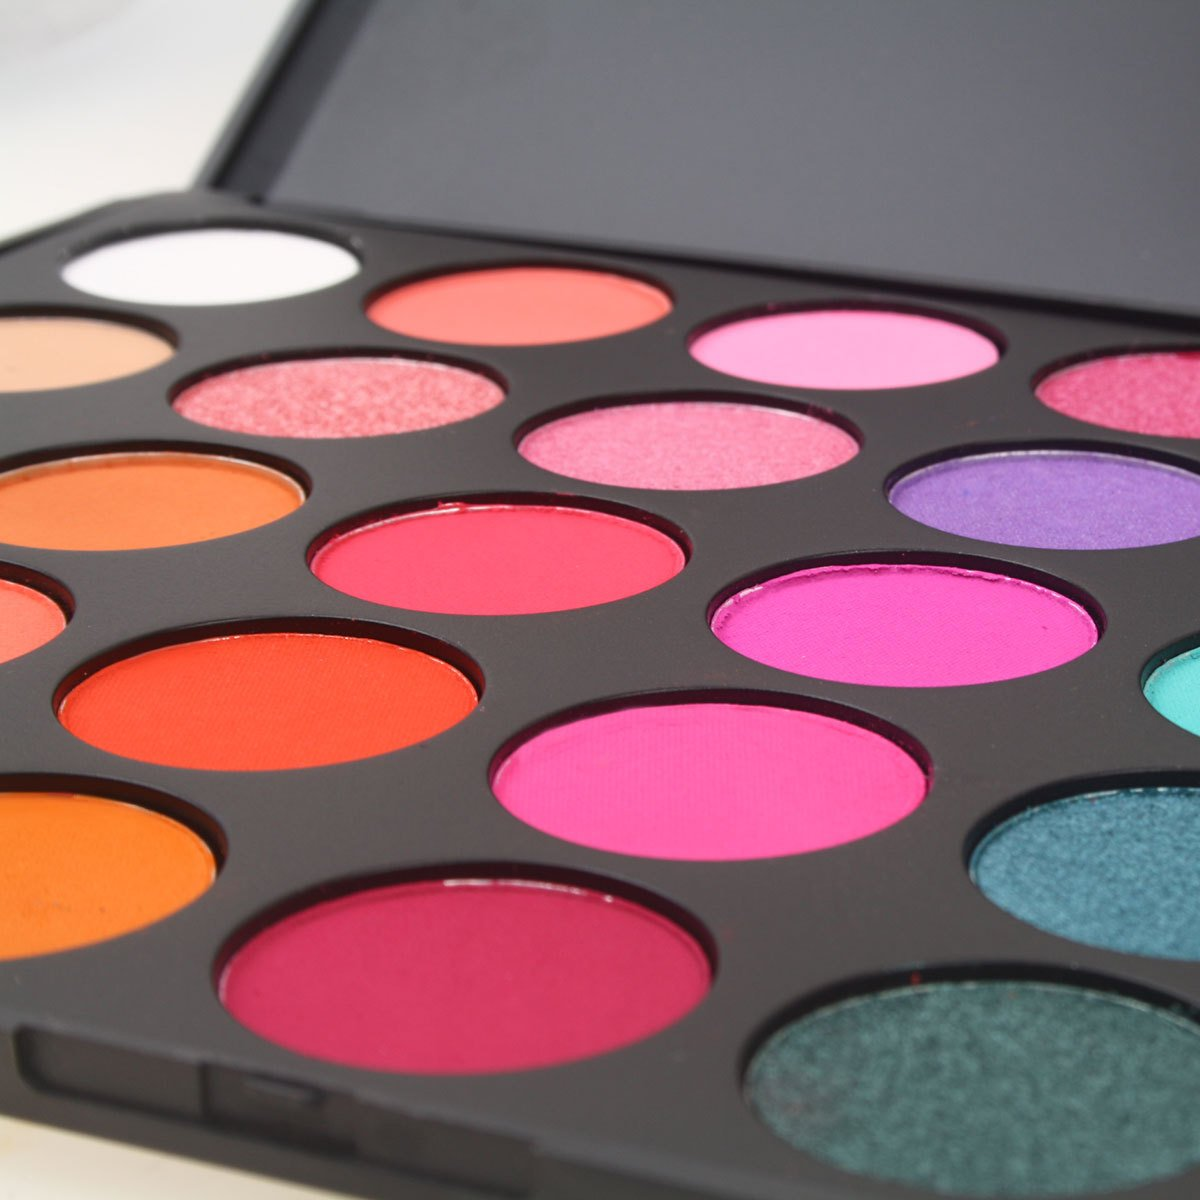 MISKOS 35 Colors Eyeshadow Palette Silky Pigmented Powder Professional Make up Waterproof Pallete Product Cosmetics Makeup Eye Shadow 35E